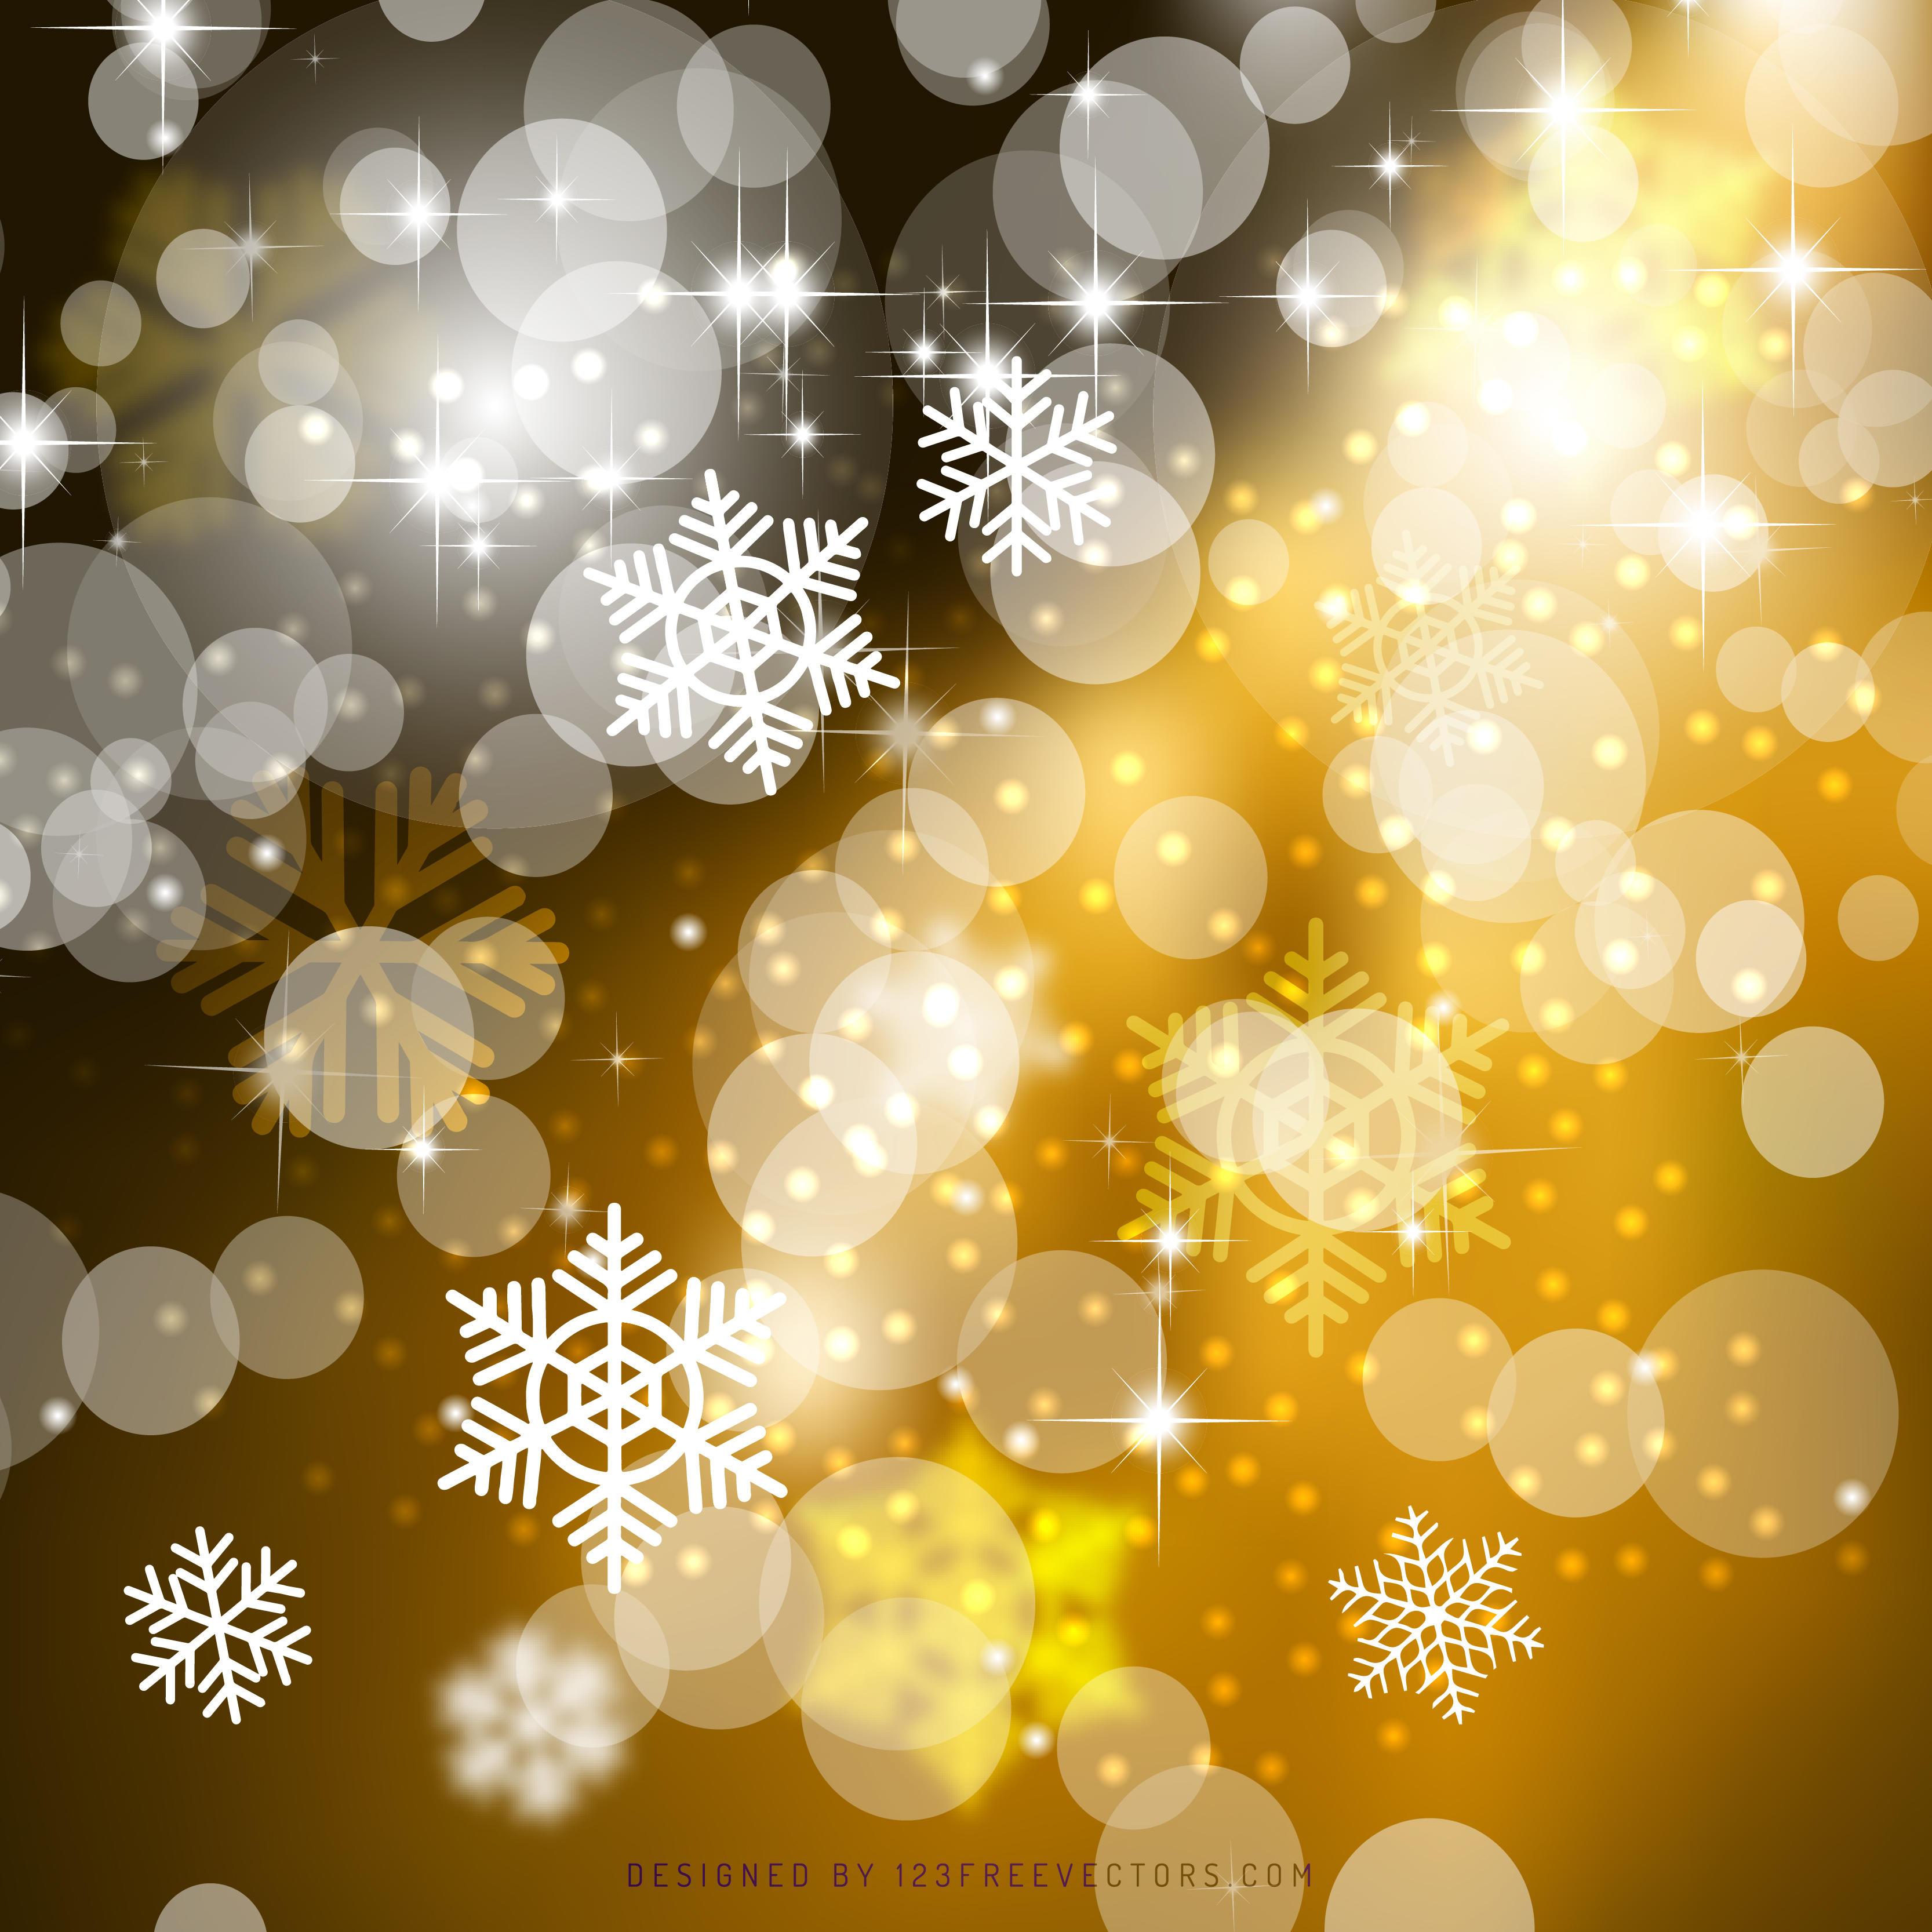 Dark Orange Christmas Bokeh Lights Background | 123Freevectors